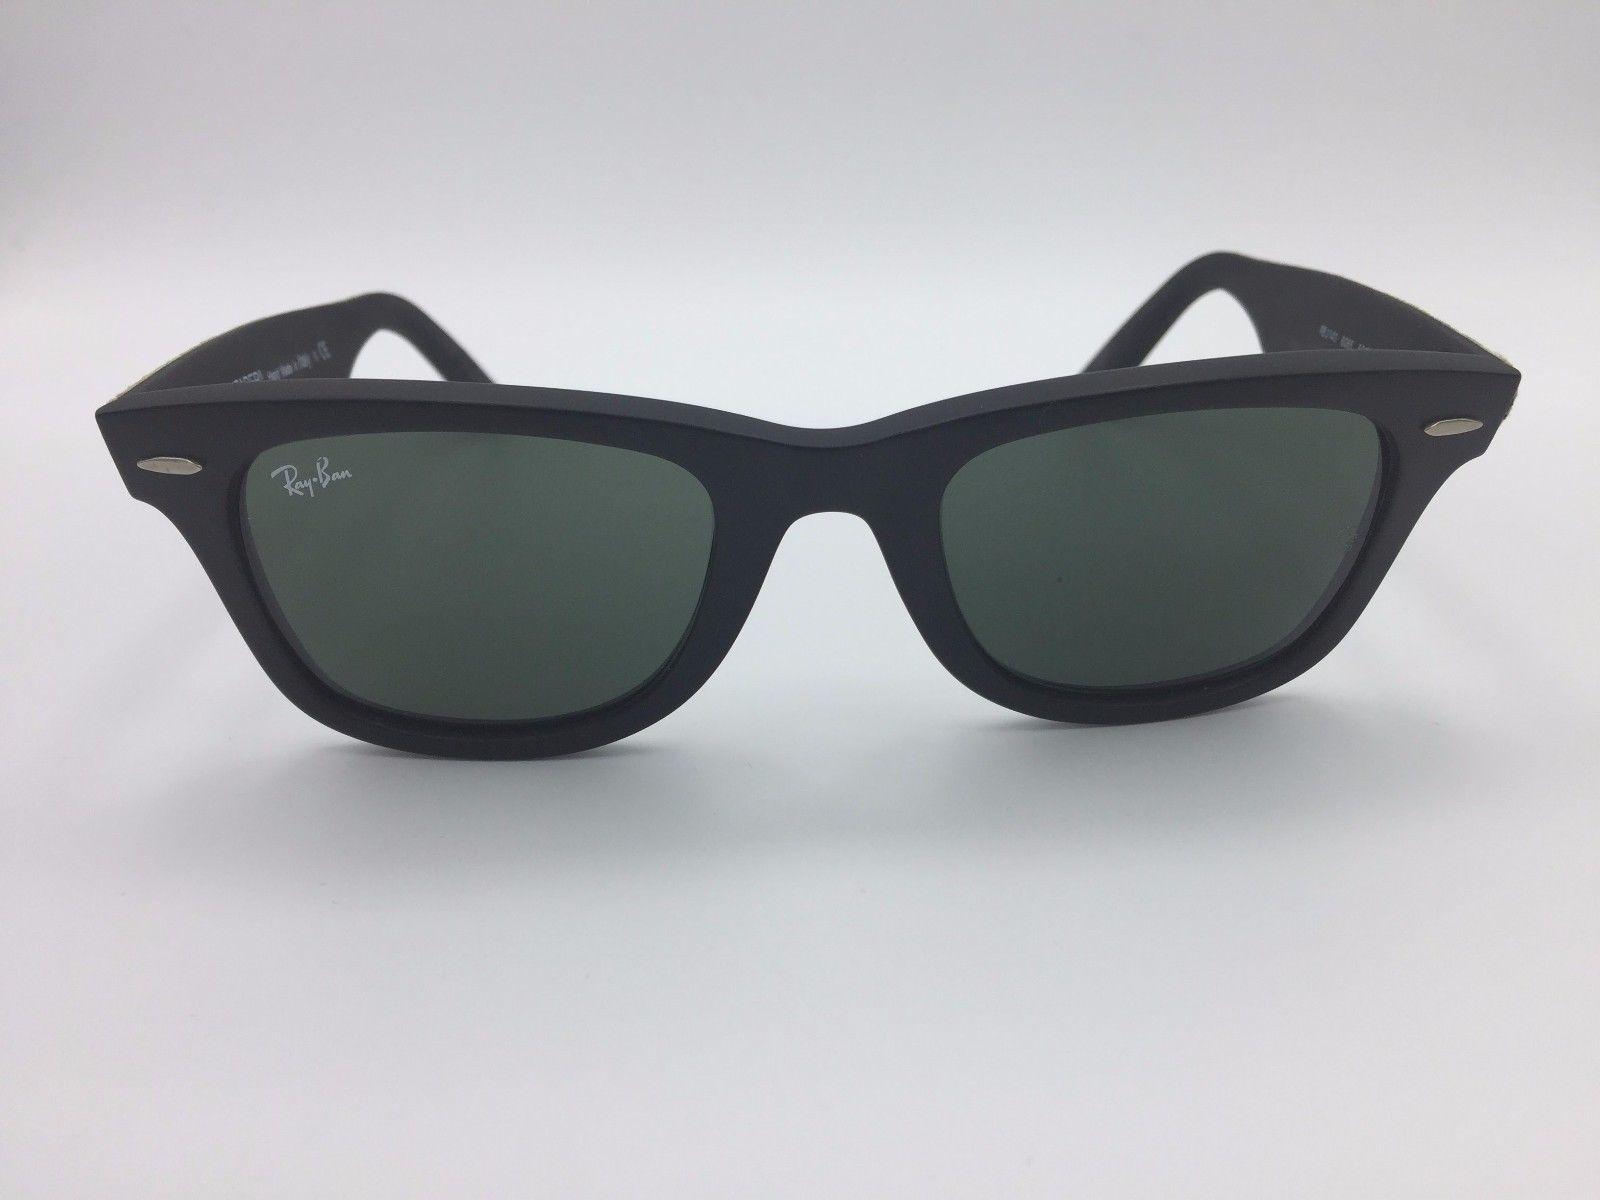 Ray Ban Sunglasses RB2140 Camo Wayfarer Frame w  Green Lens   Style ... 61055ad0ad